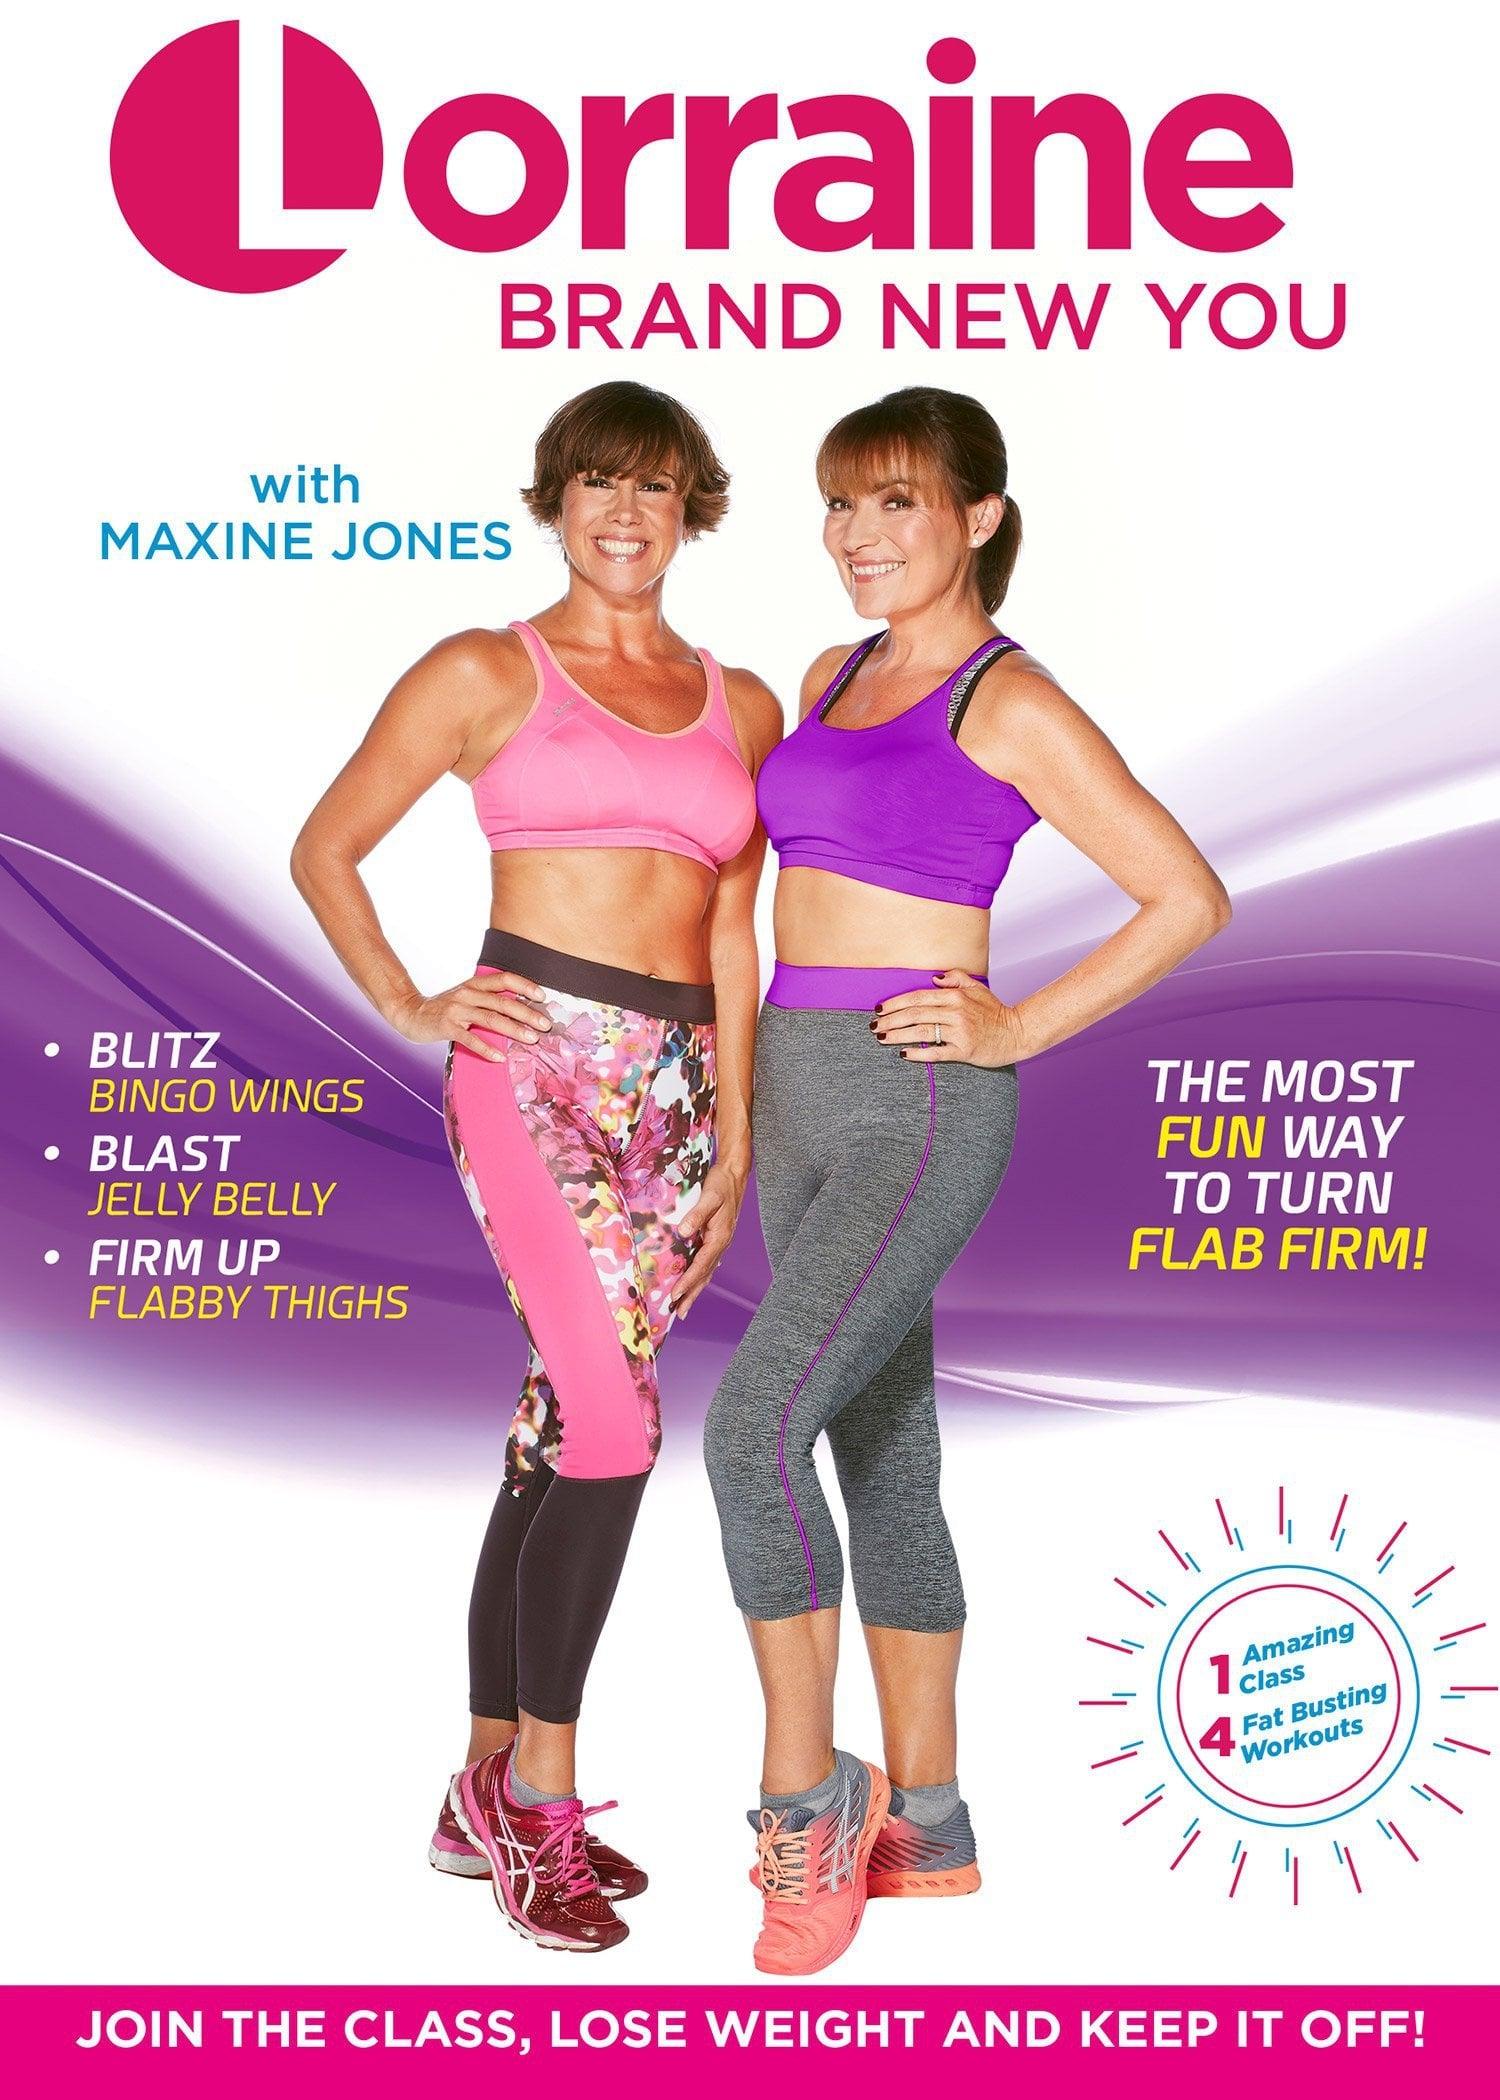 Lorraine's Brand New You